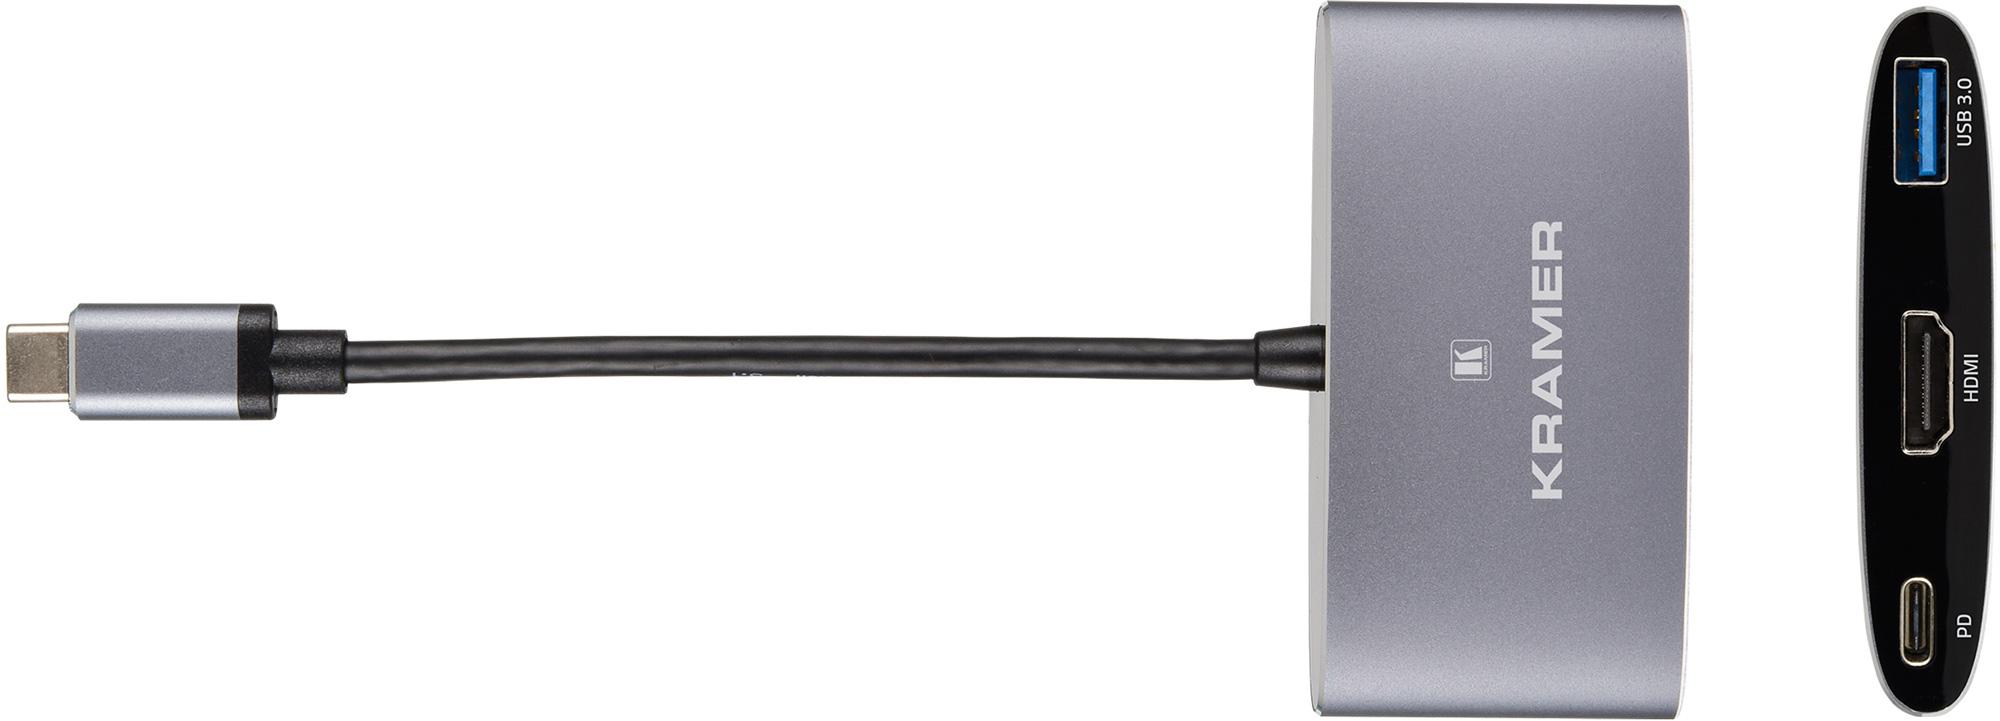 Kramer KDOCK-1 USB-C Hub Multiport Adapter - USB-C Charging Pass-Through - USB 3.0 - 4k@30 HDMI Output KR-KDOCK-1